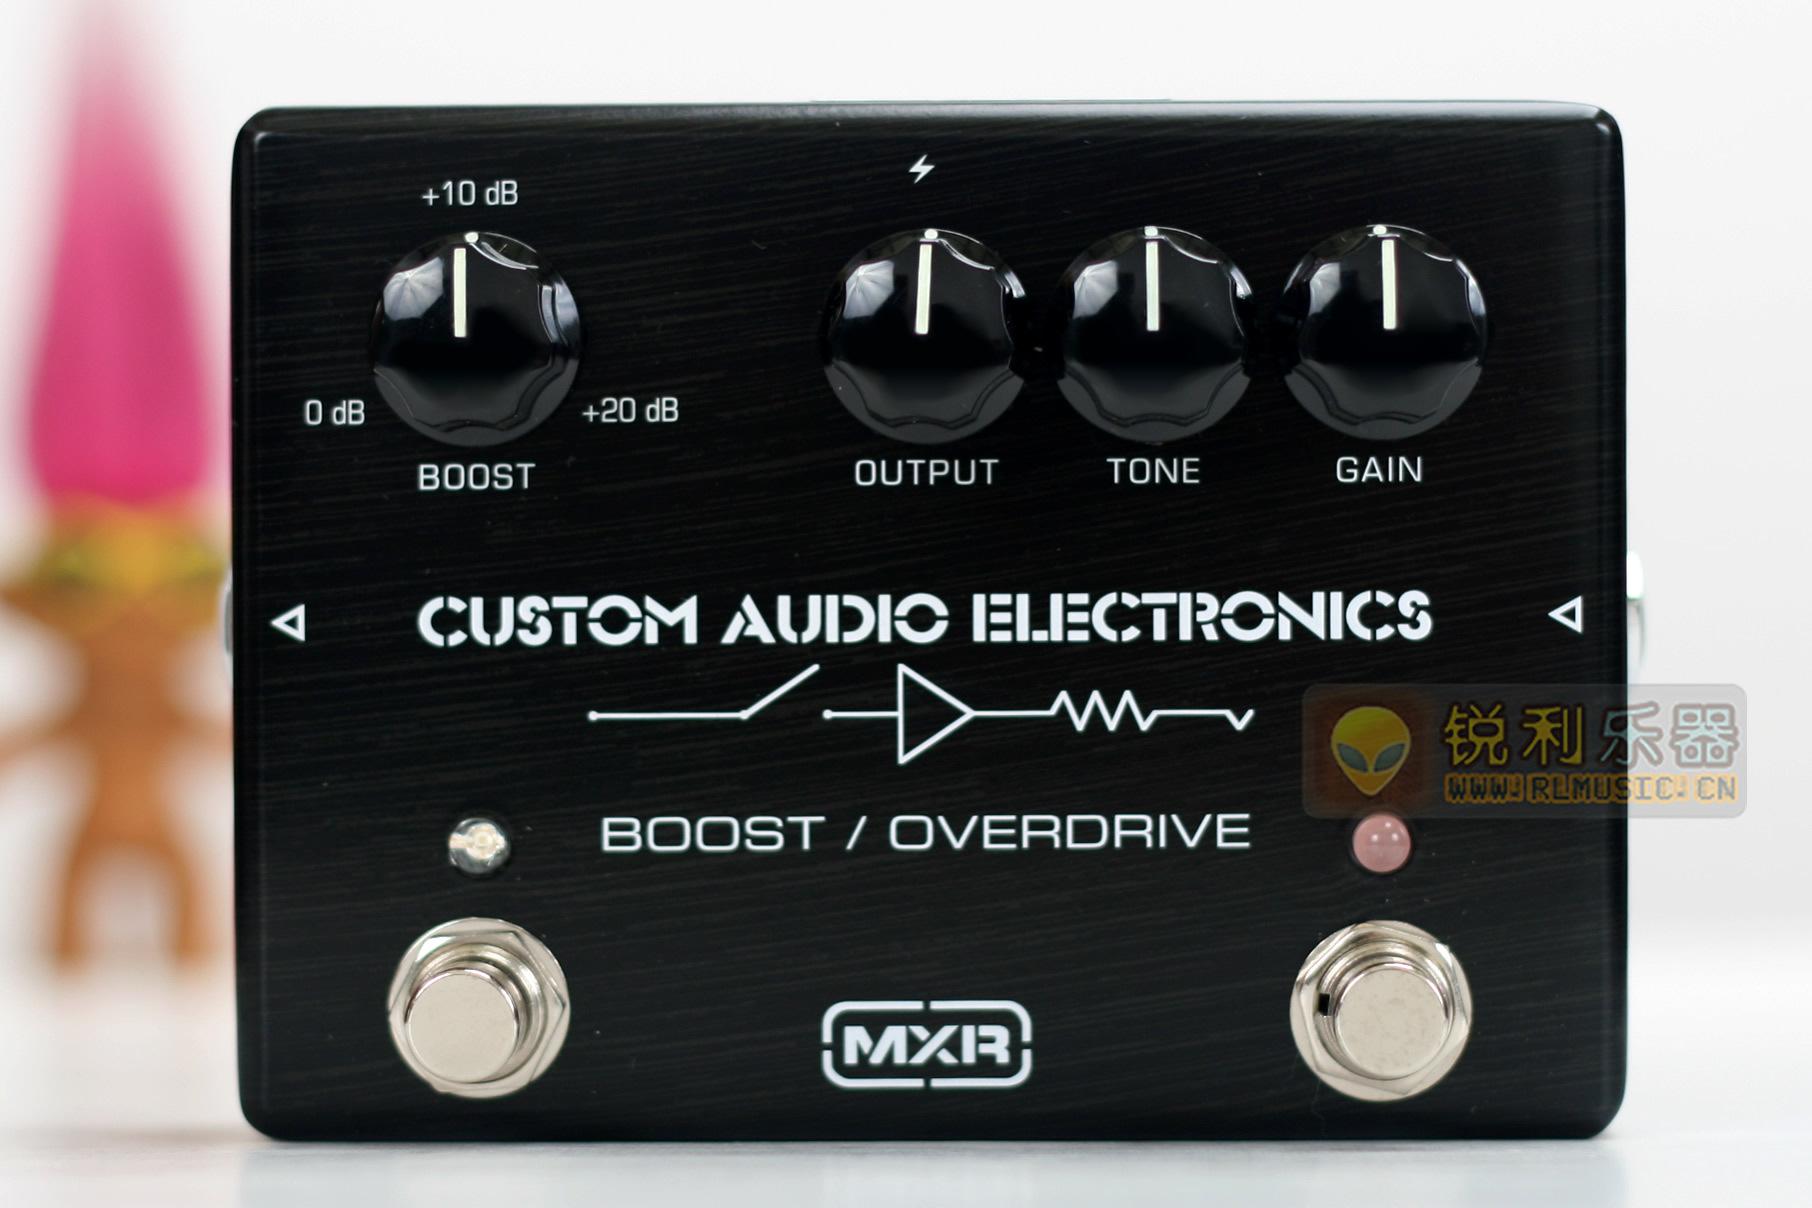 【MXR CAE MC402 Boost Overdrive】激励过载效果器【锐利乐器】